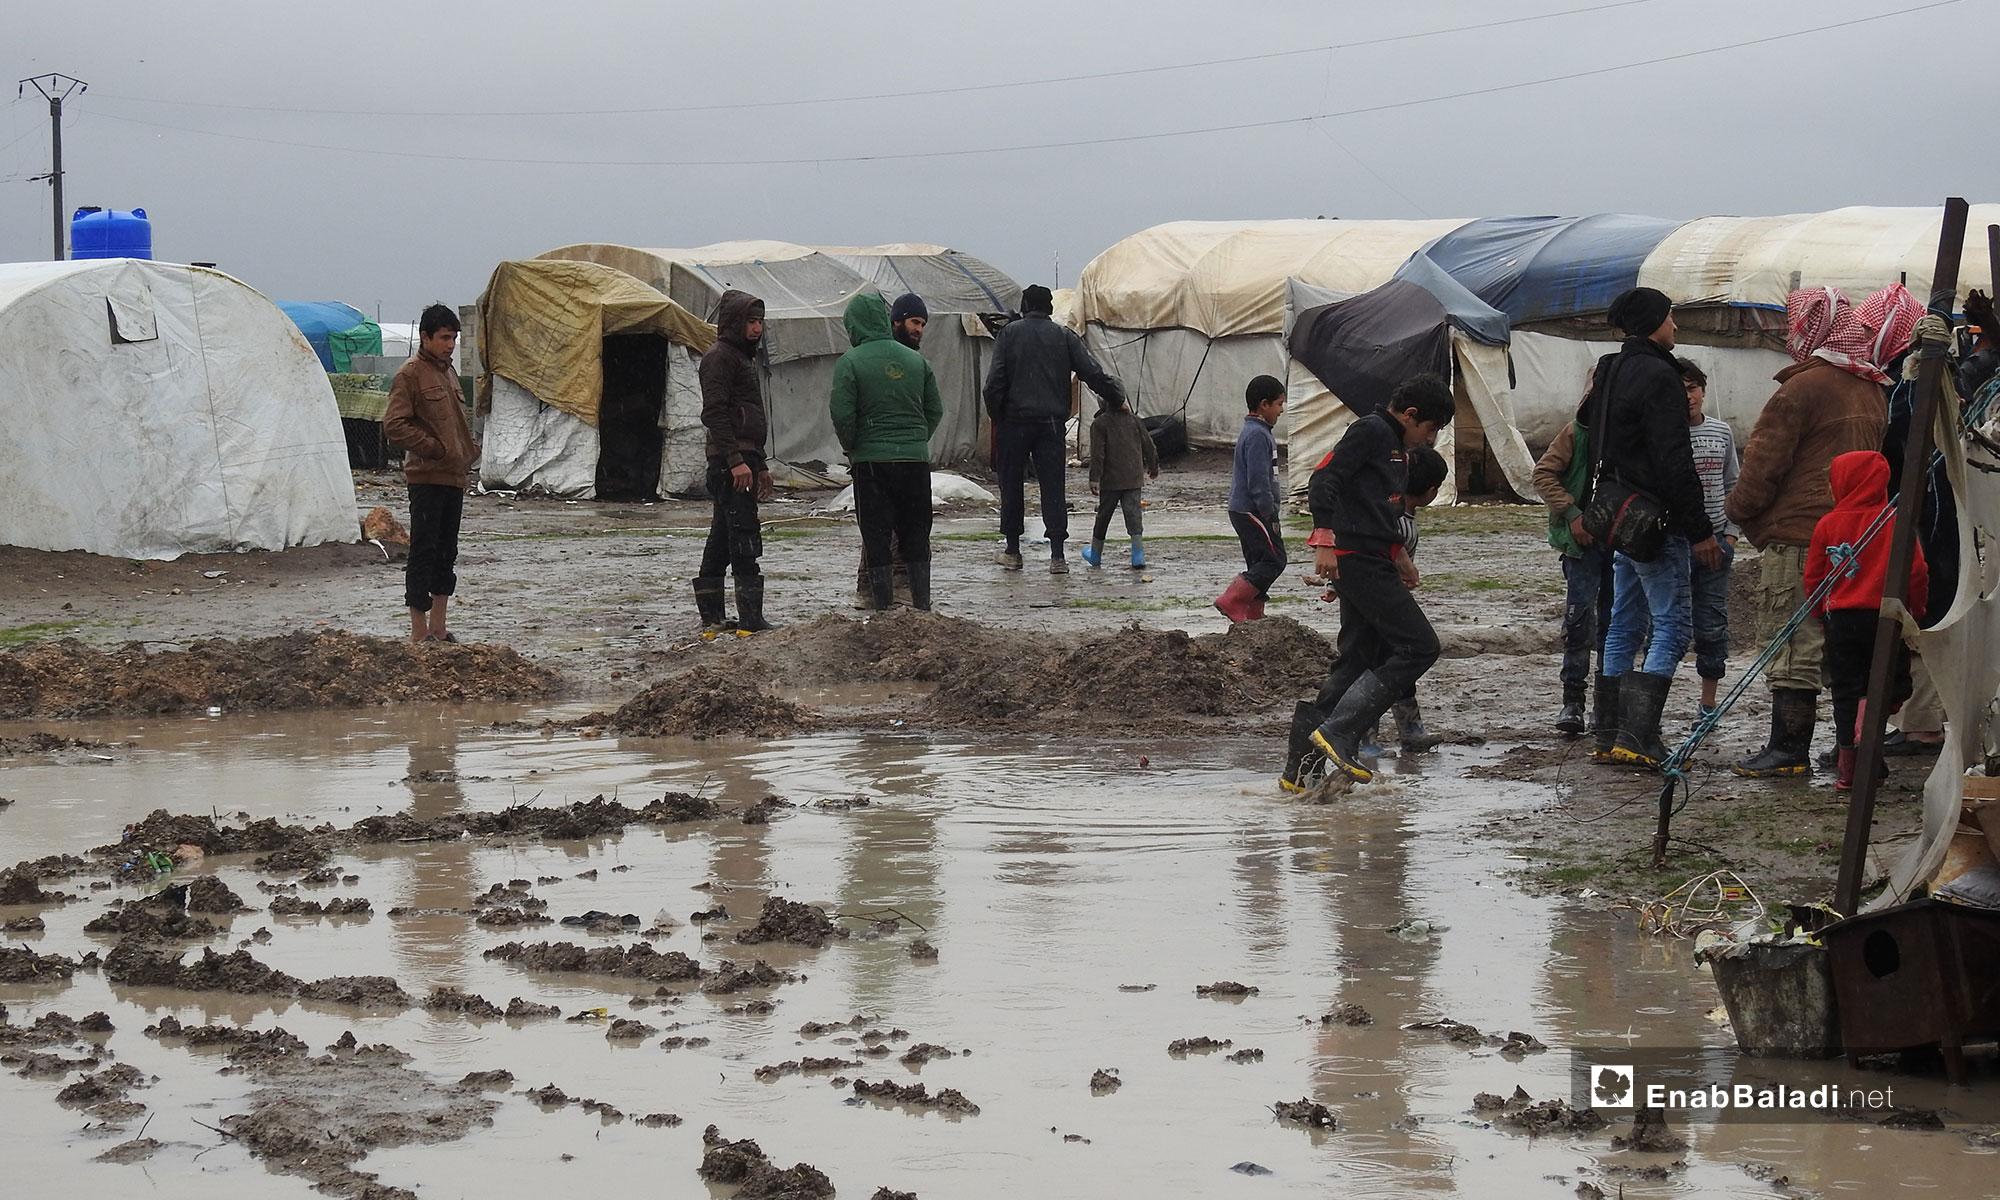 Children at the al-Marj camp, following a rainstorm in northern rural Aleppo – December 27, 2018 (Enab Baladi)